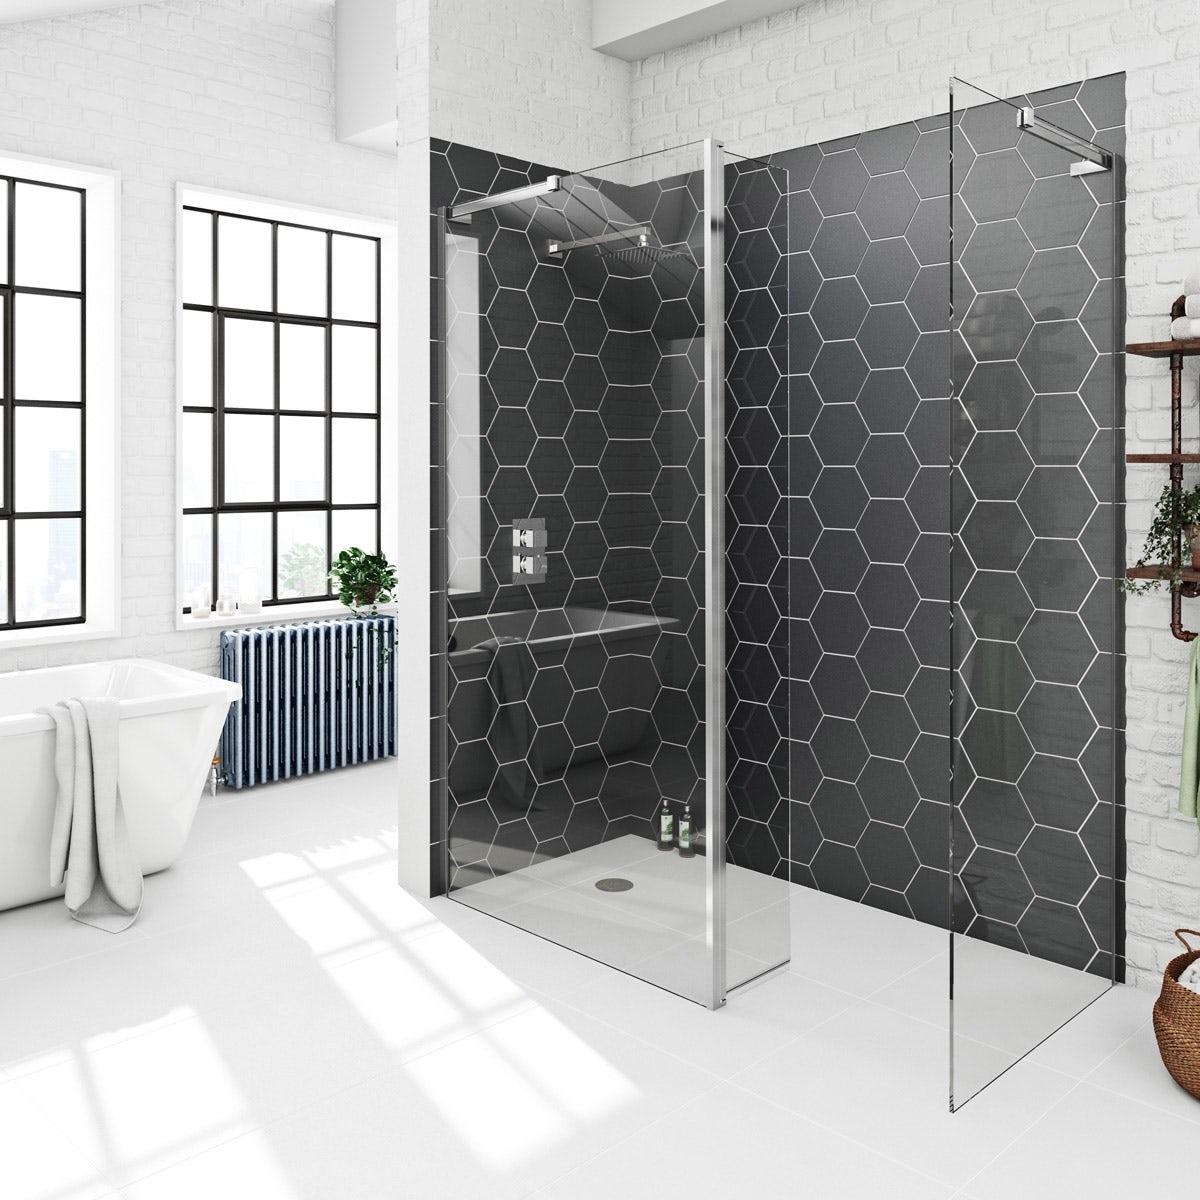 Mode 8mm wet room pack with return panel 1600 x 800 | VictoriaPlum.com